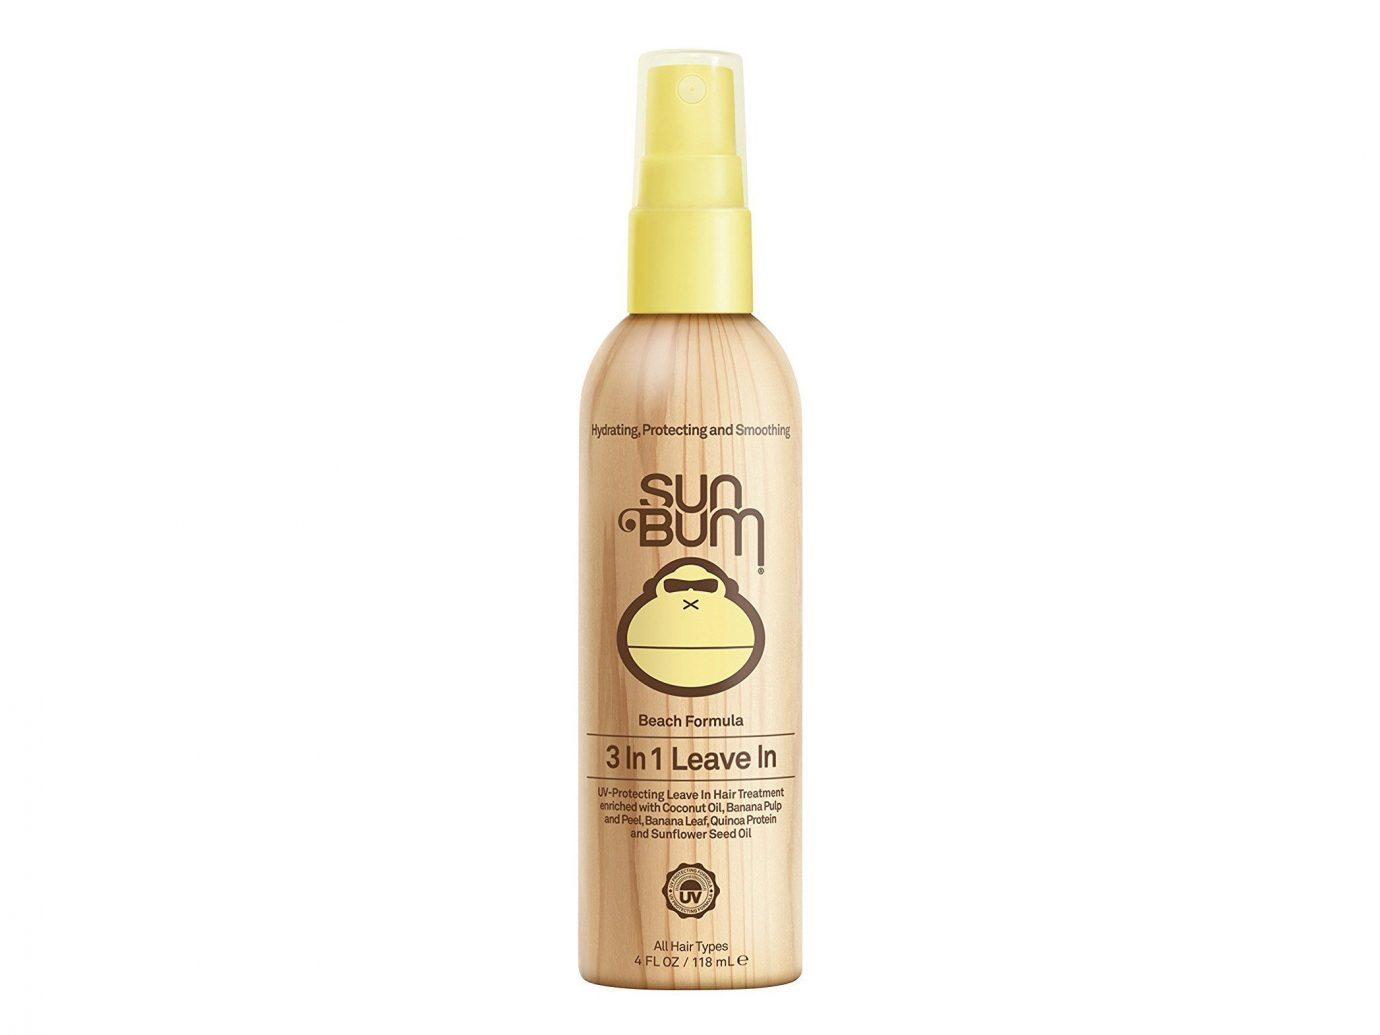 Beauty Health + Wellness Travel Shop product beverage alcohol skin care lotion liquid spray flavor